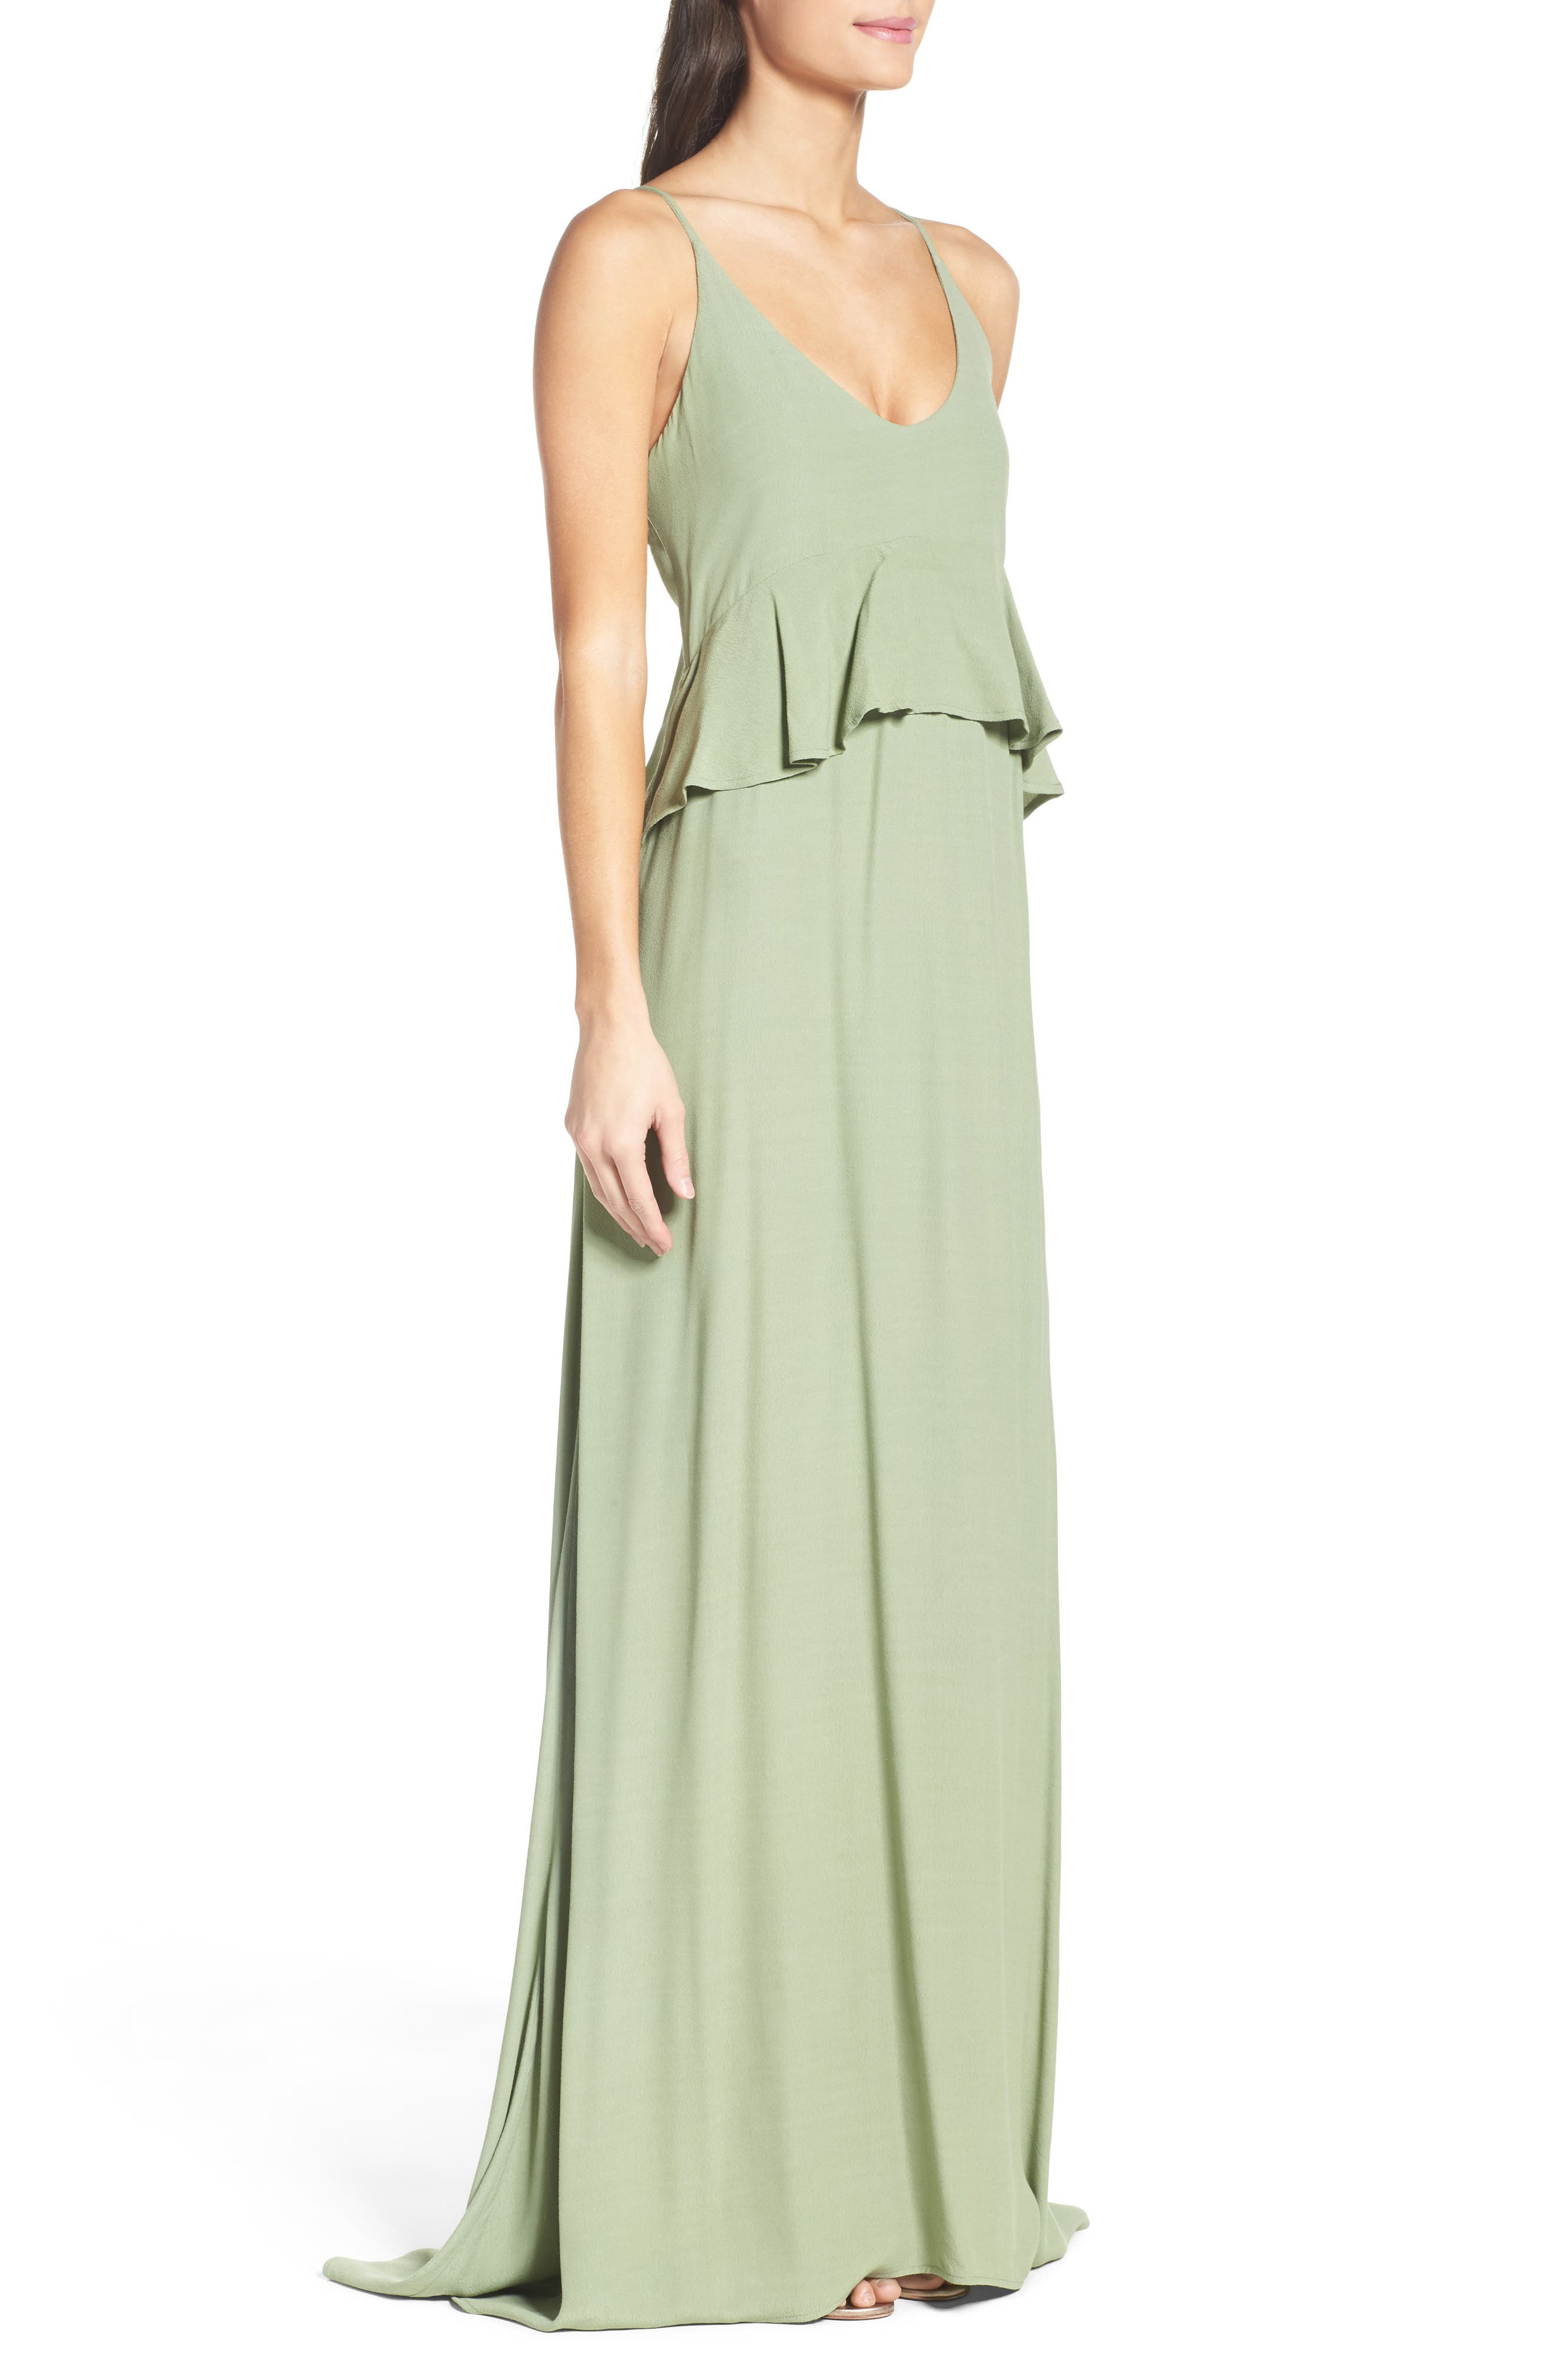 Roe + May Jolie Crepe Peplum Dress,                             Alternate thumbnail 3, color,                             310